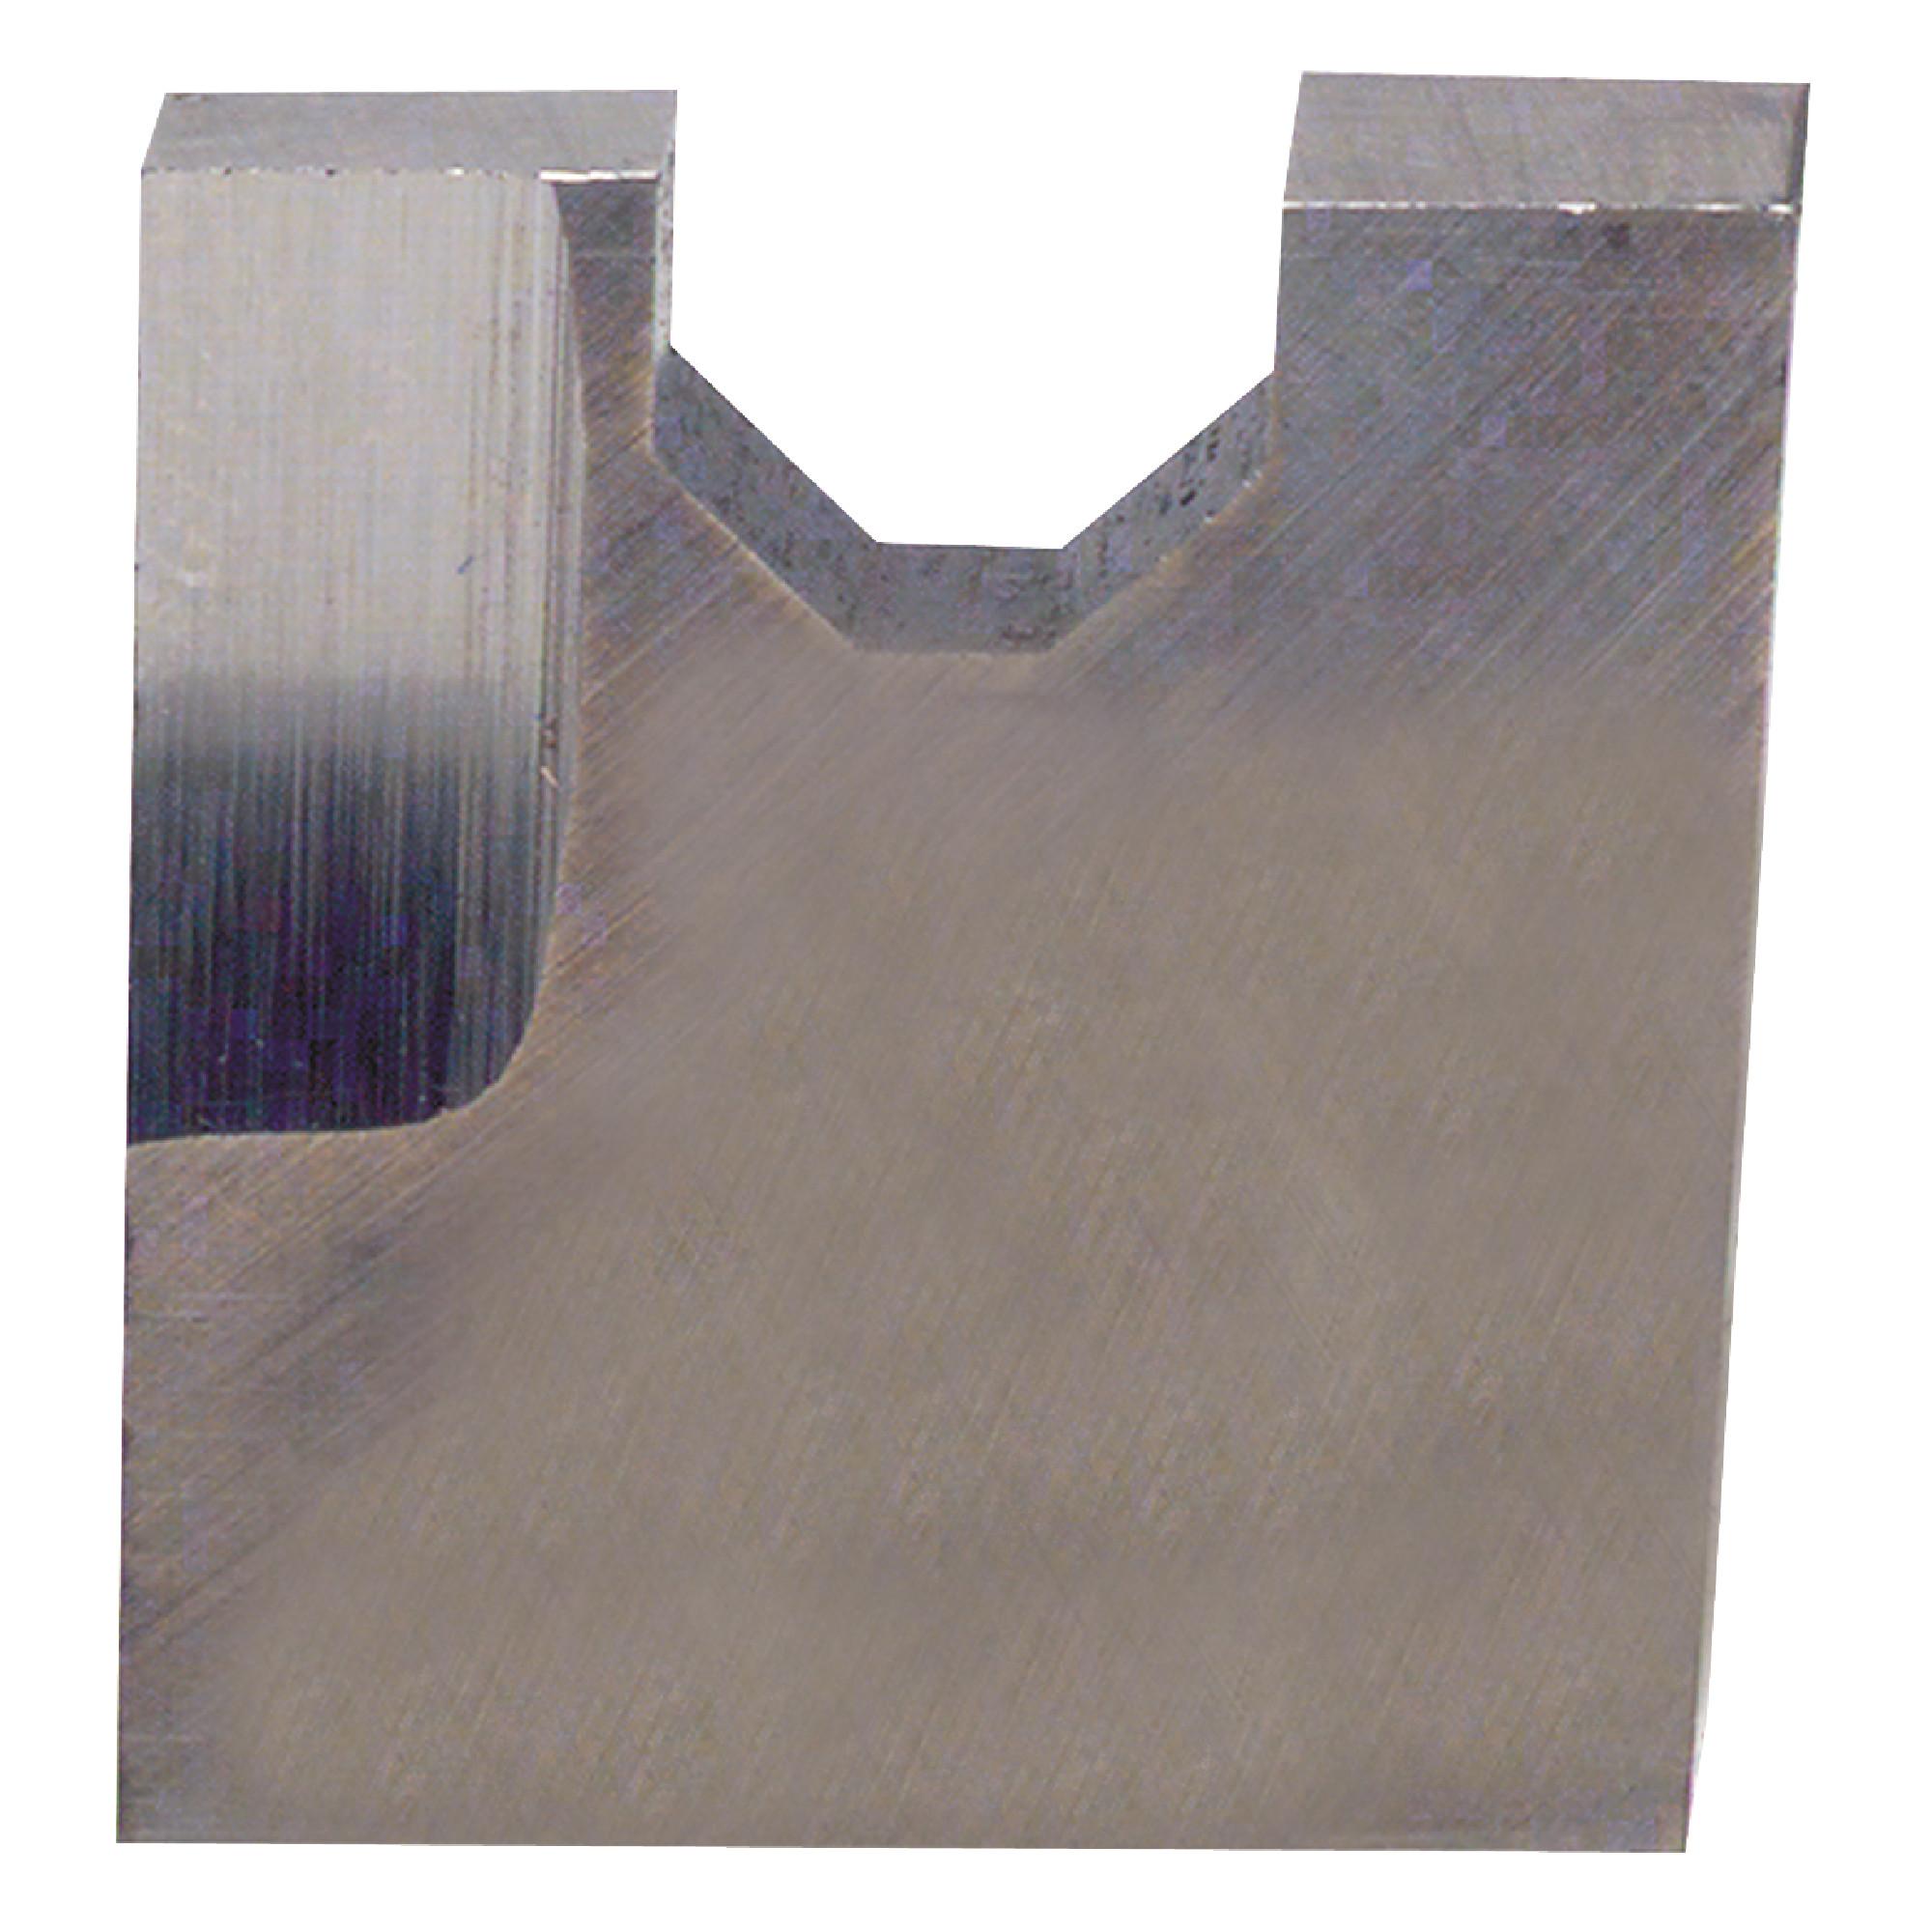 "APT - 1"" High Speed Steel Counterbore Blade / Series: D"